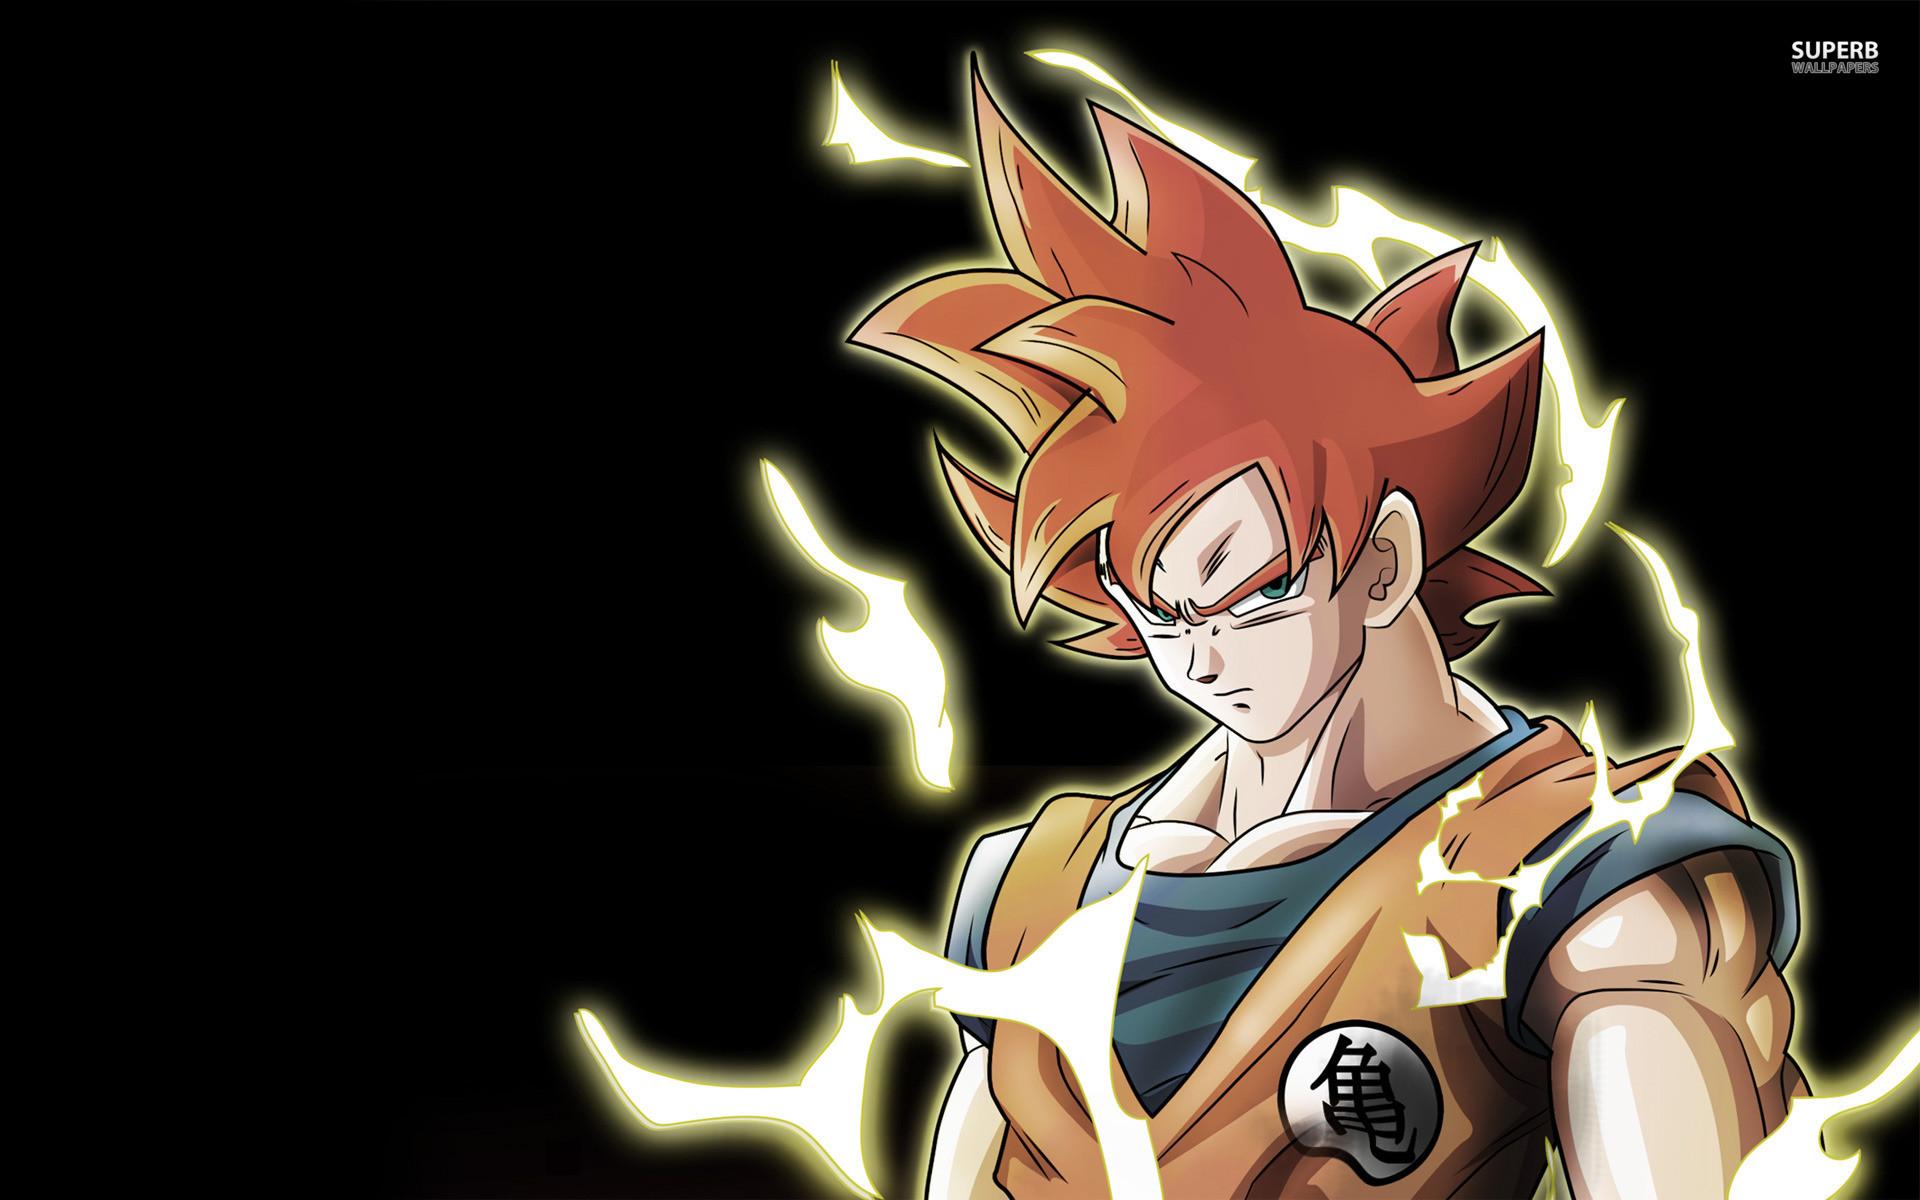 Dragon Ball Z Wallpapers Goku Wallpaper